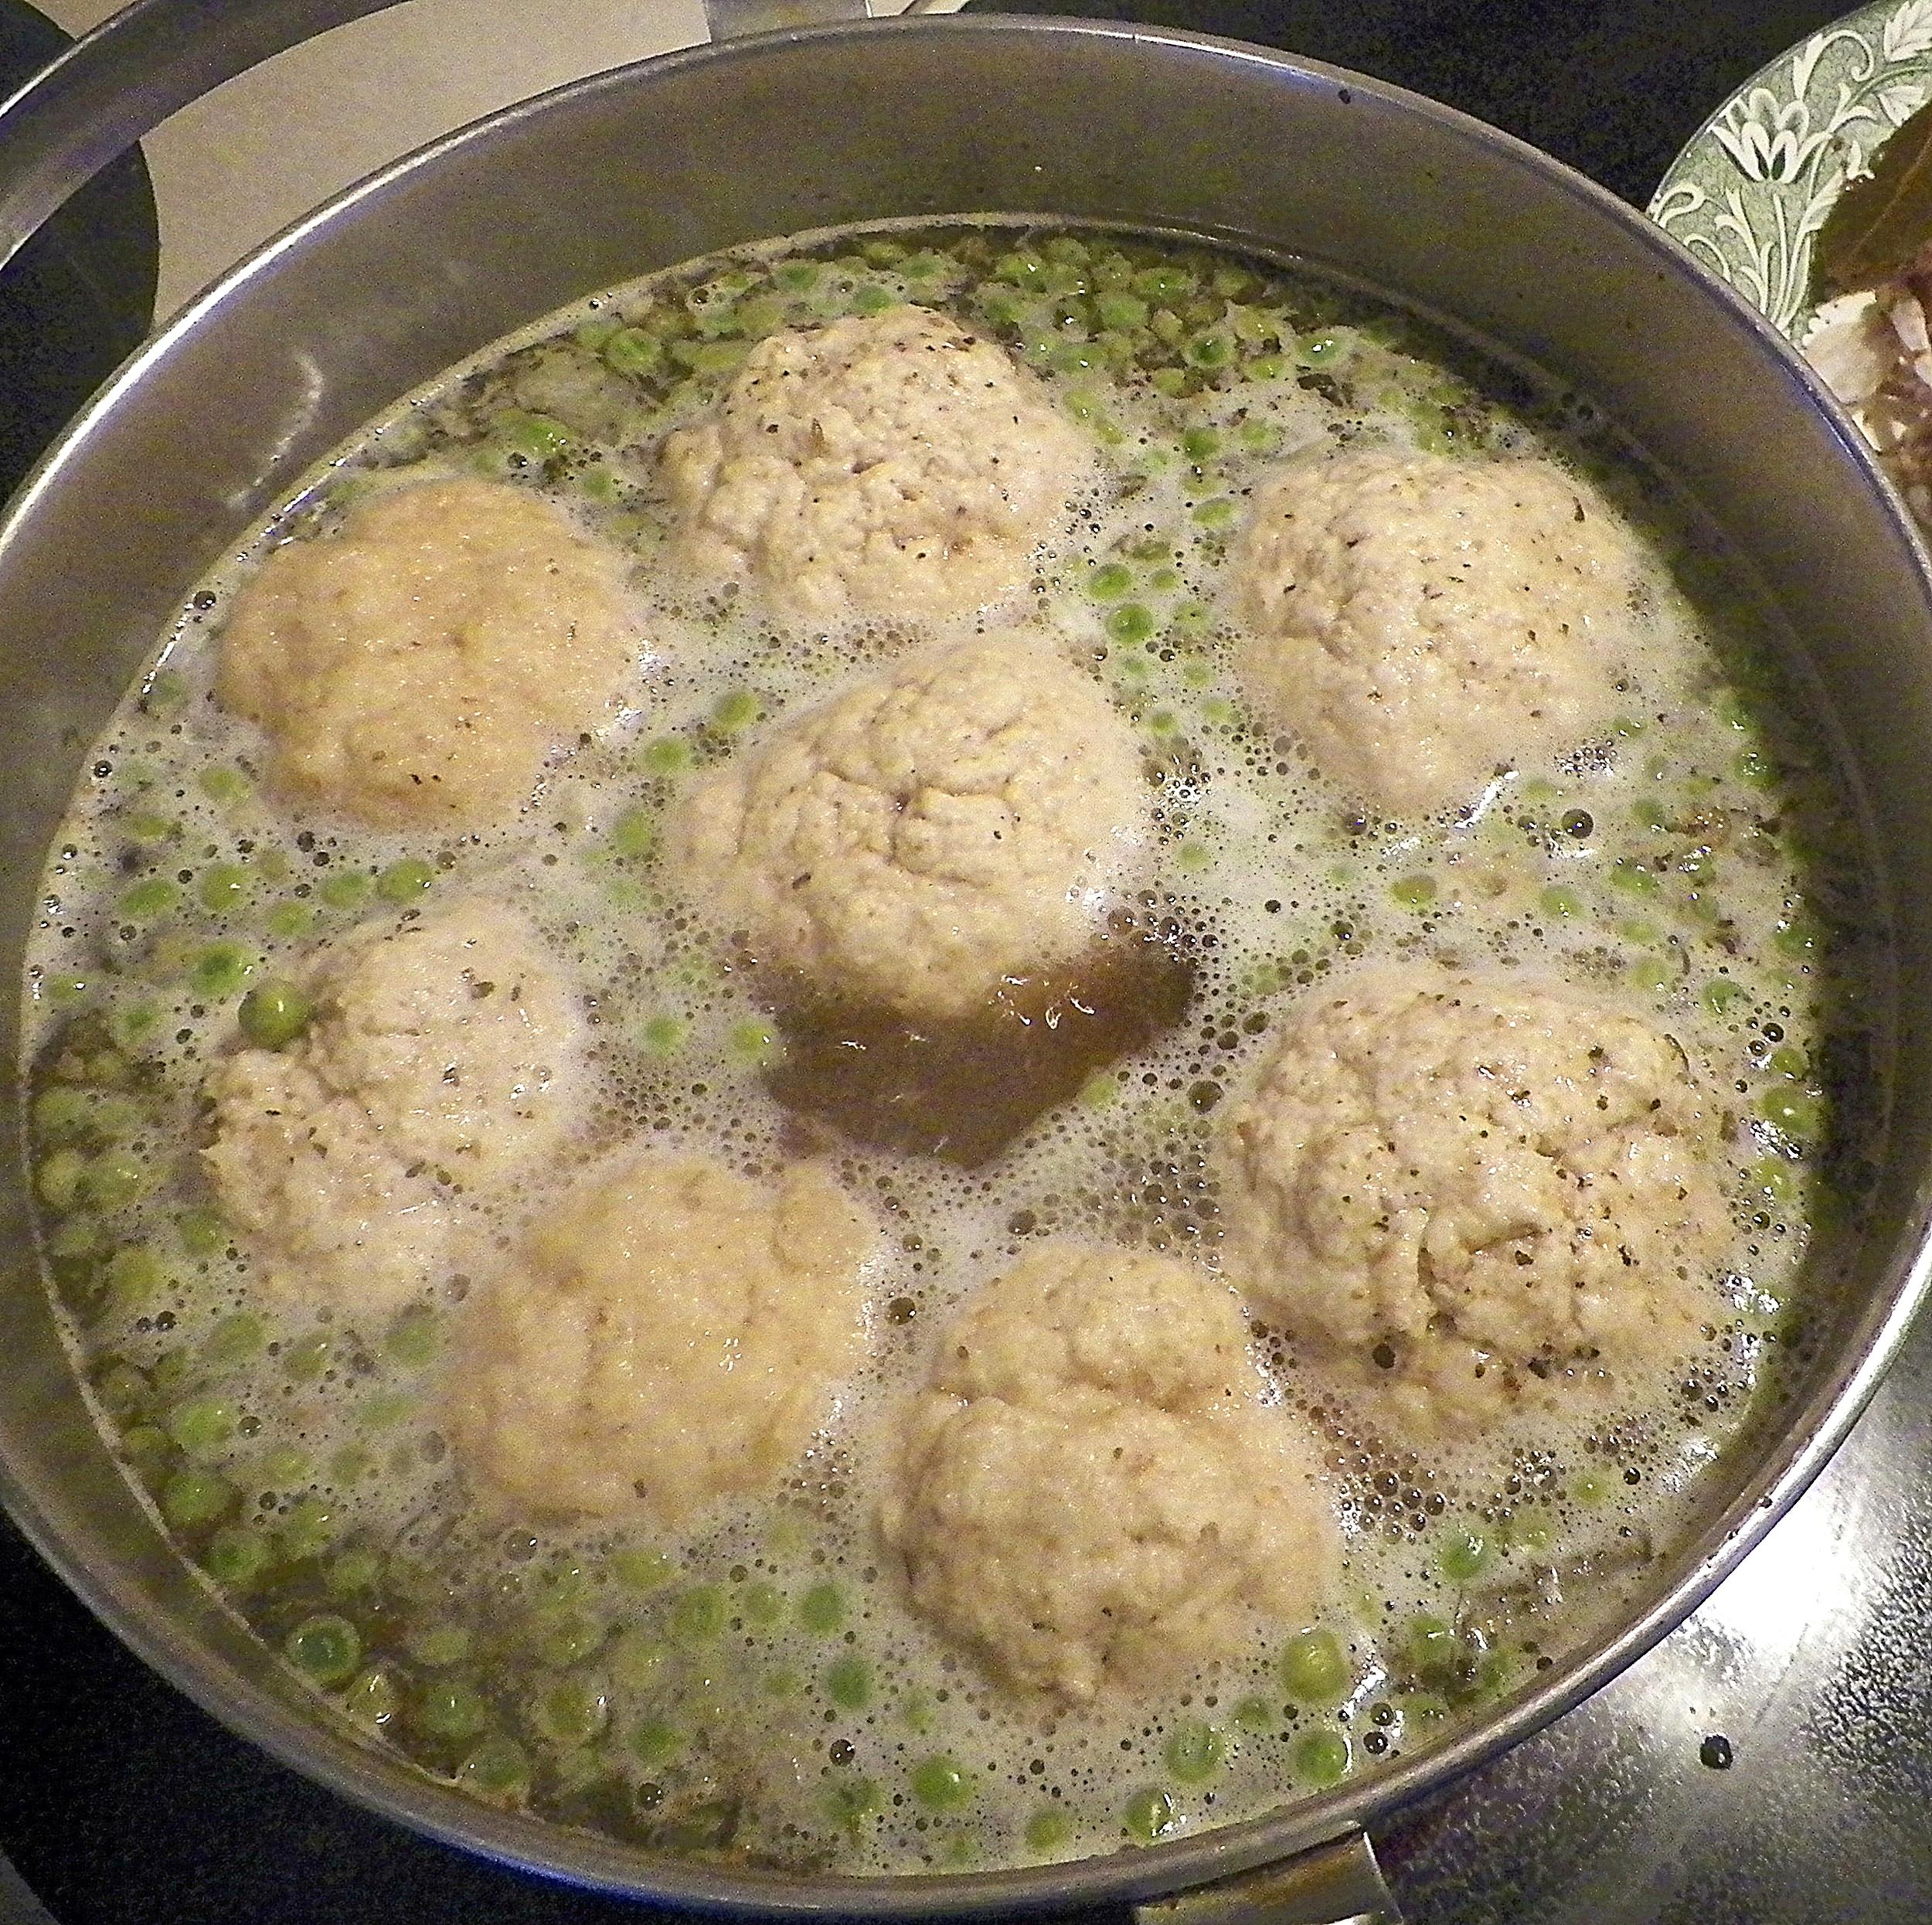 Dumplings simmering.